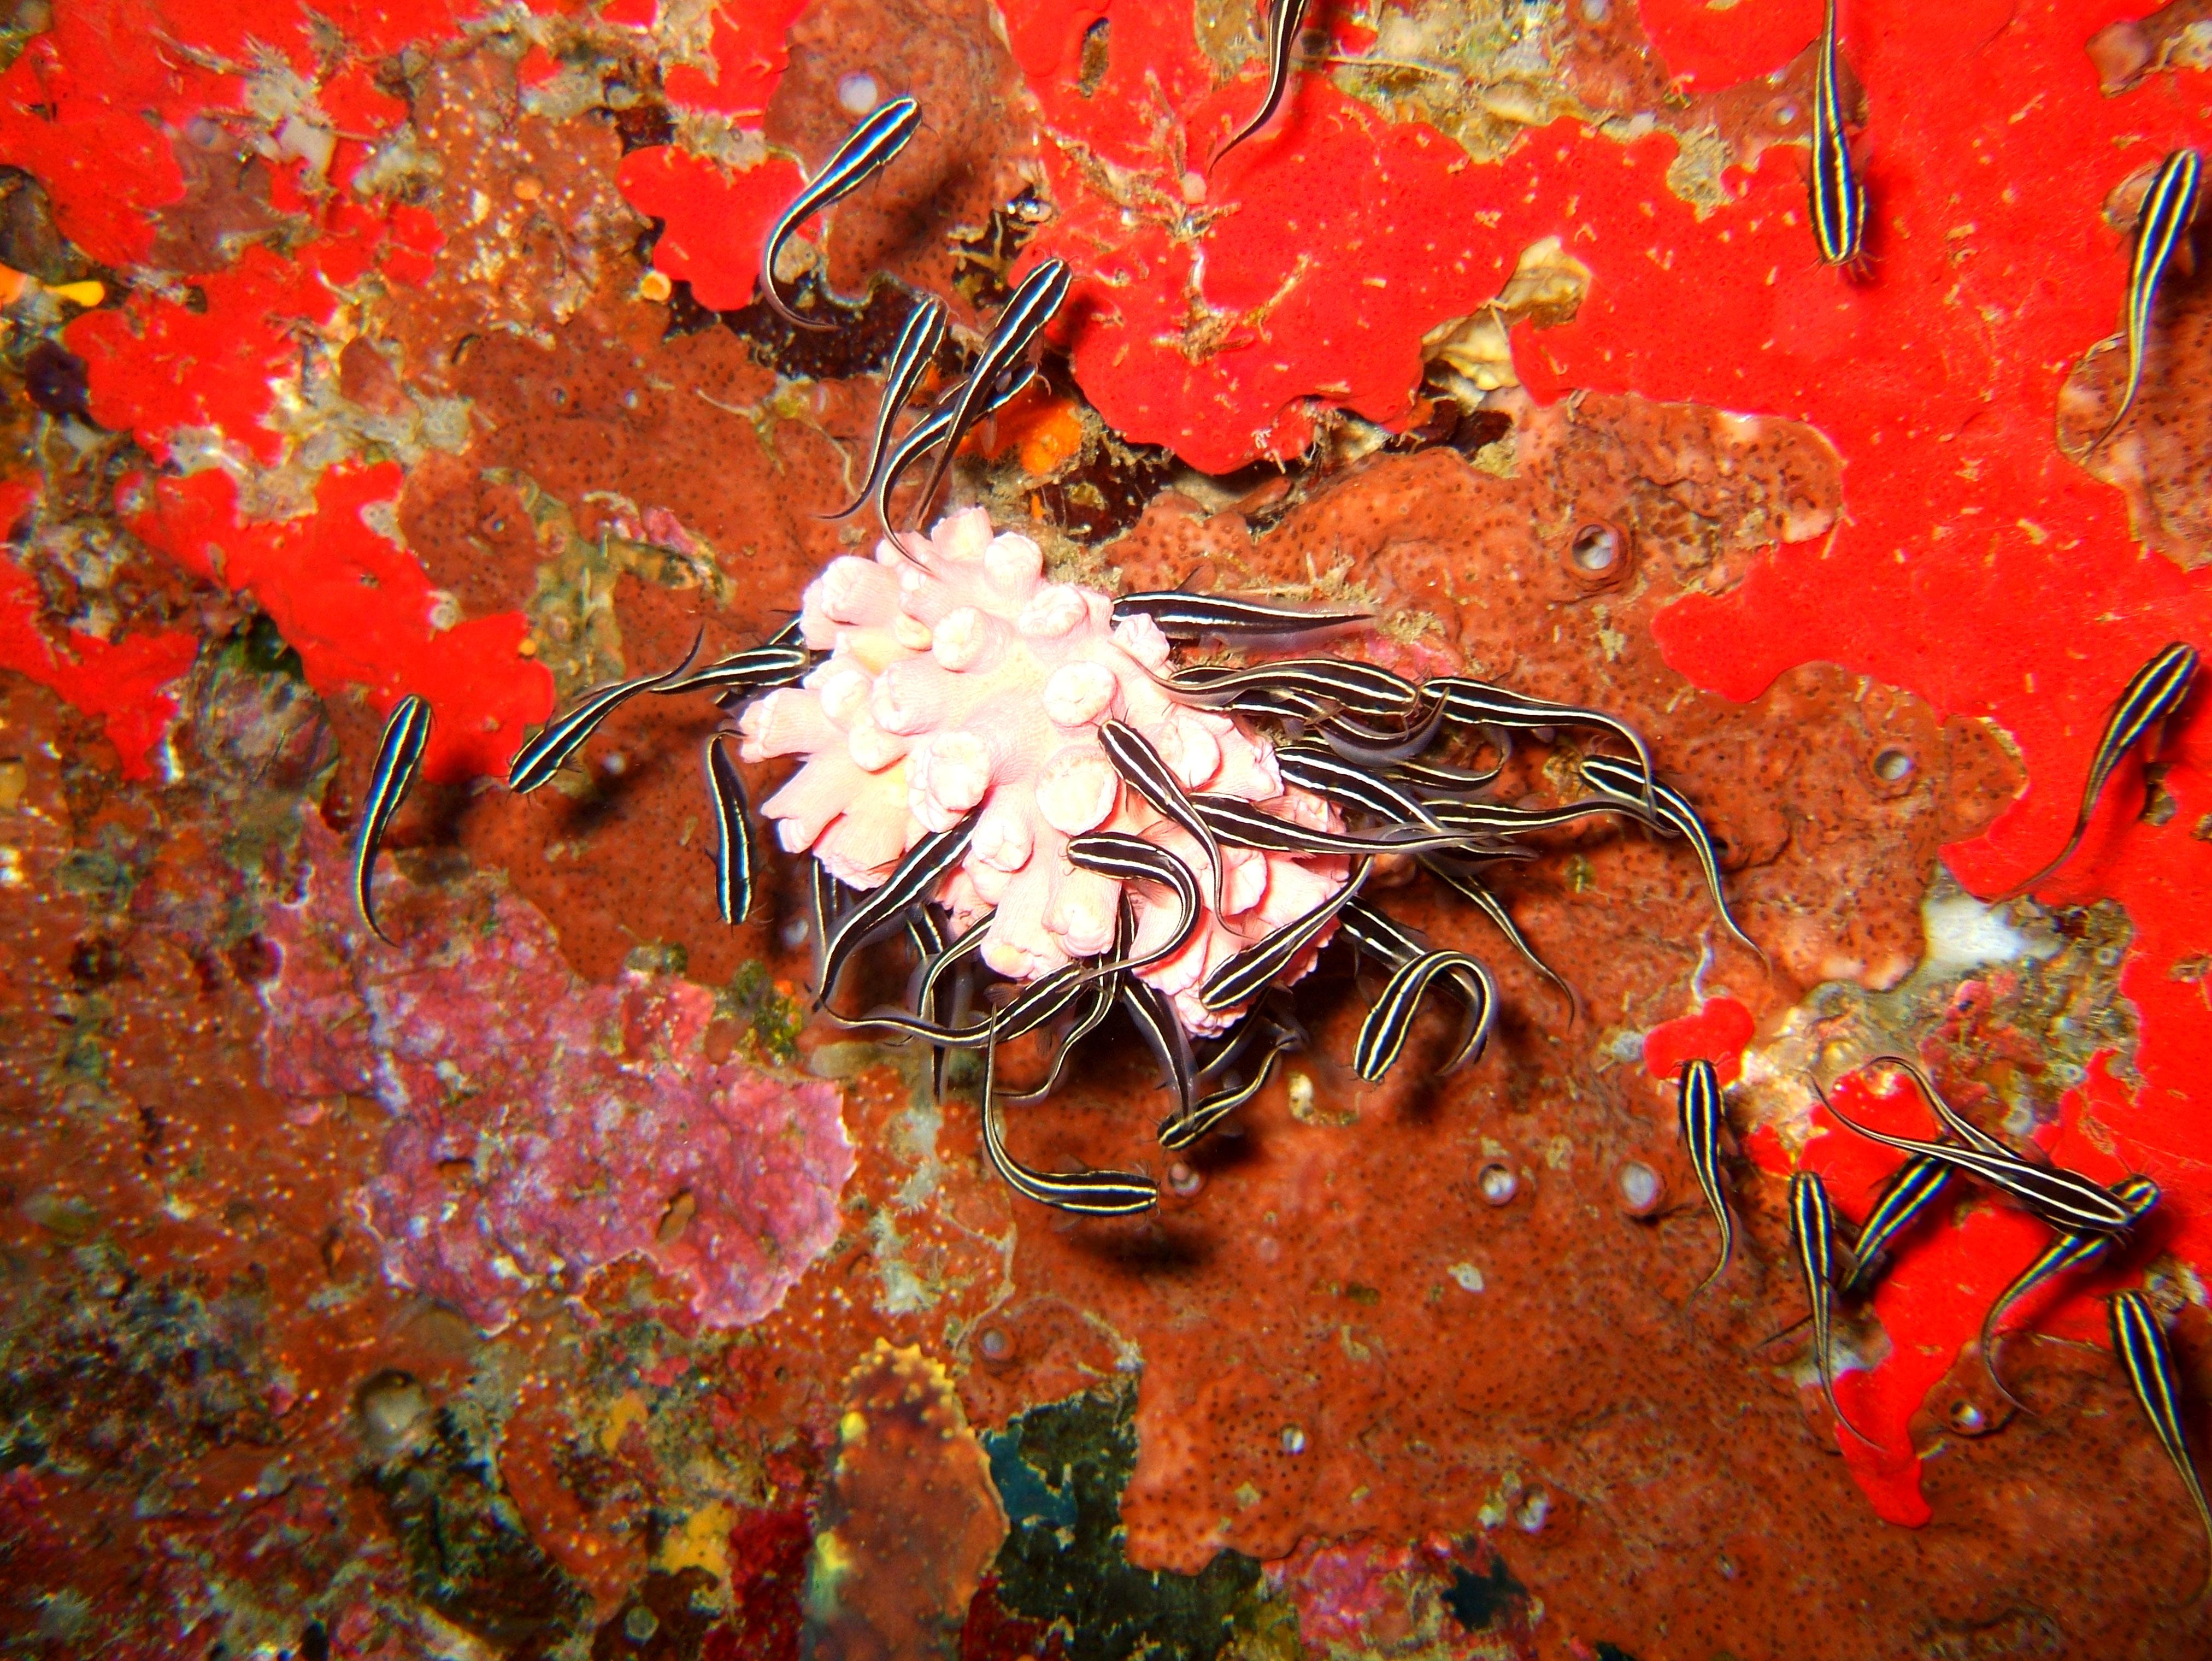 Philippines Cebu Moal Boal 20051227 Dive 1 Pescador Island 60